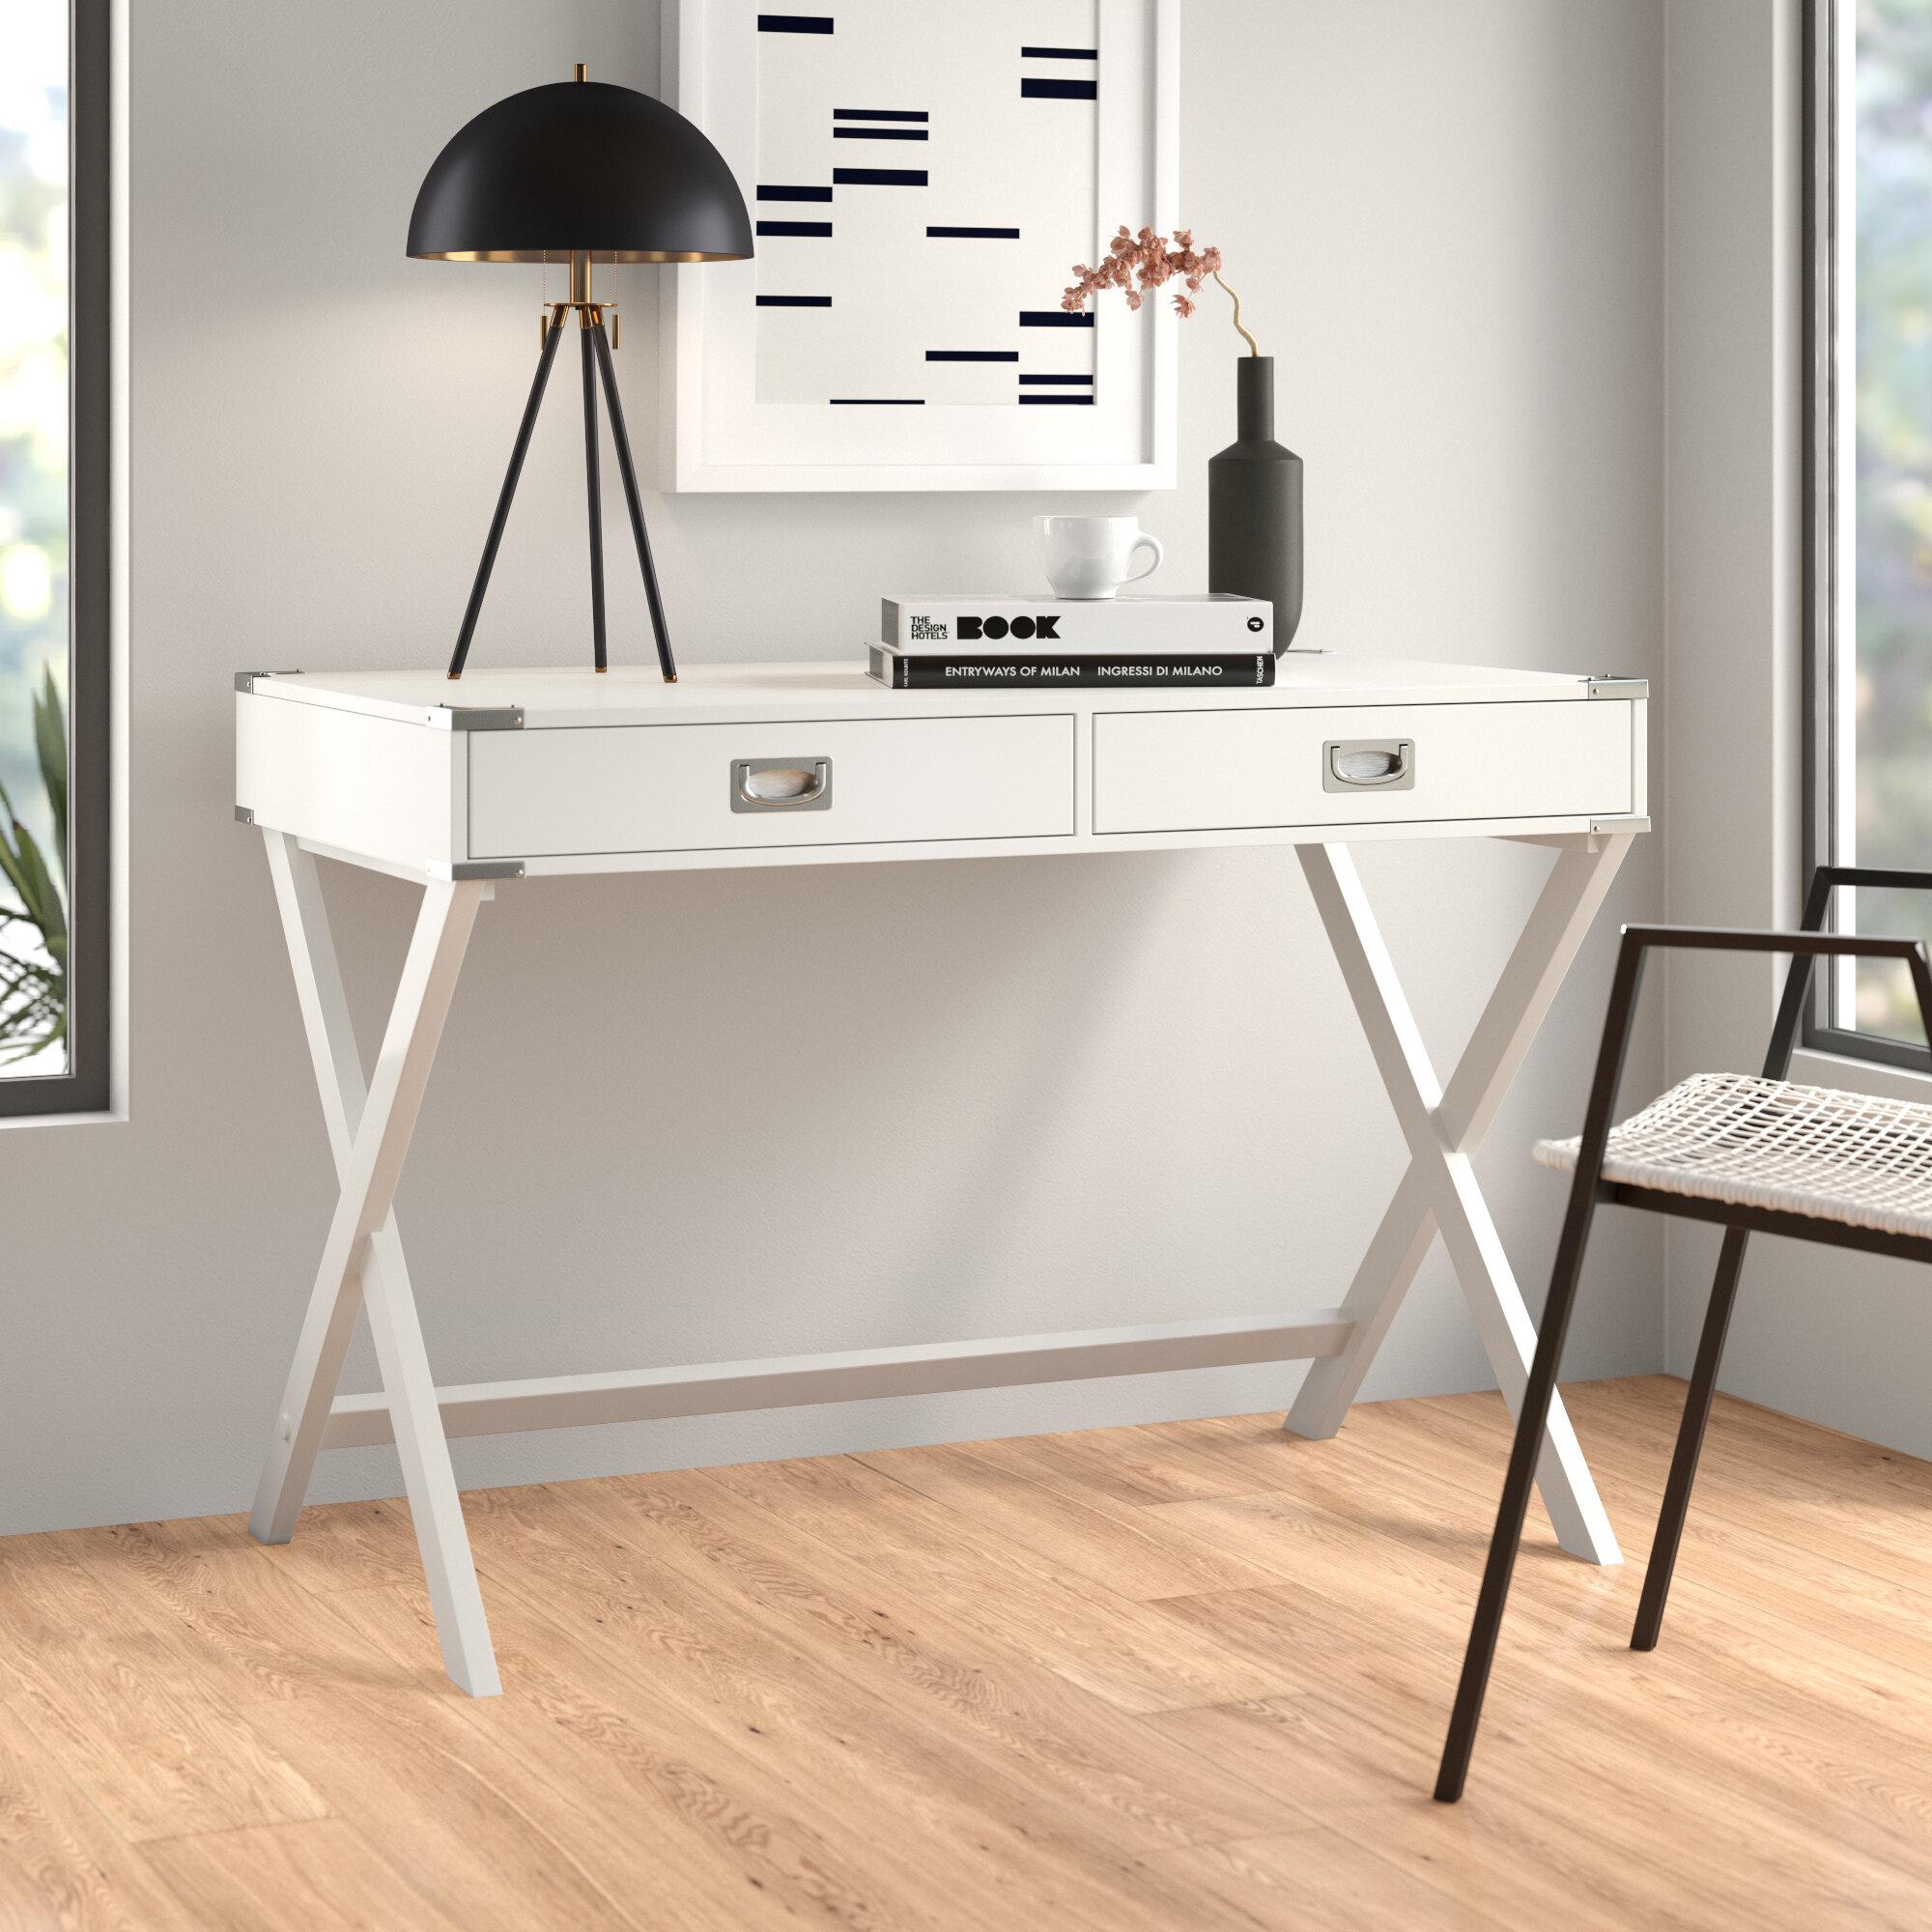 Peachy Modern Contemporary Desk Wall Unit Allmodern Download Free Architecture Designs Rallybritishbridgeorg